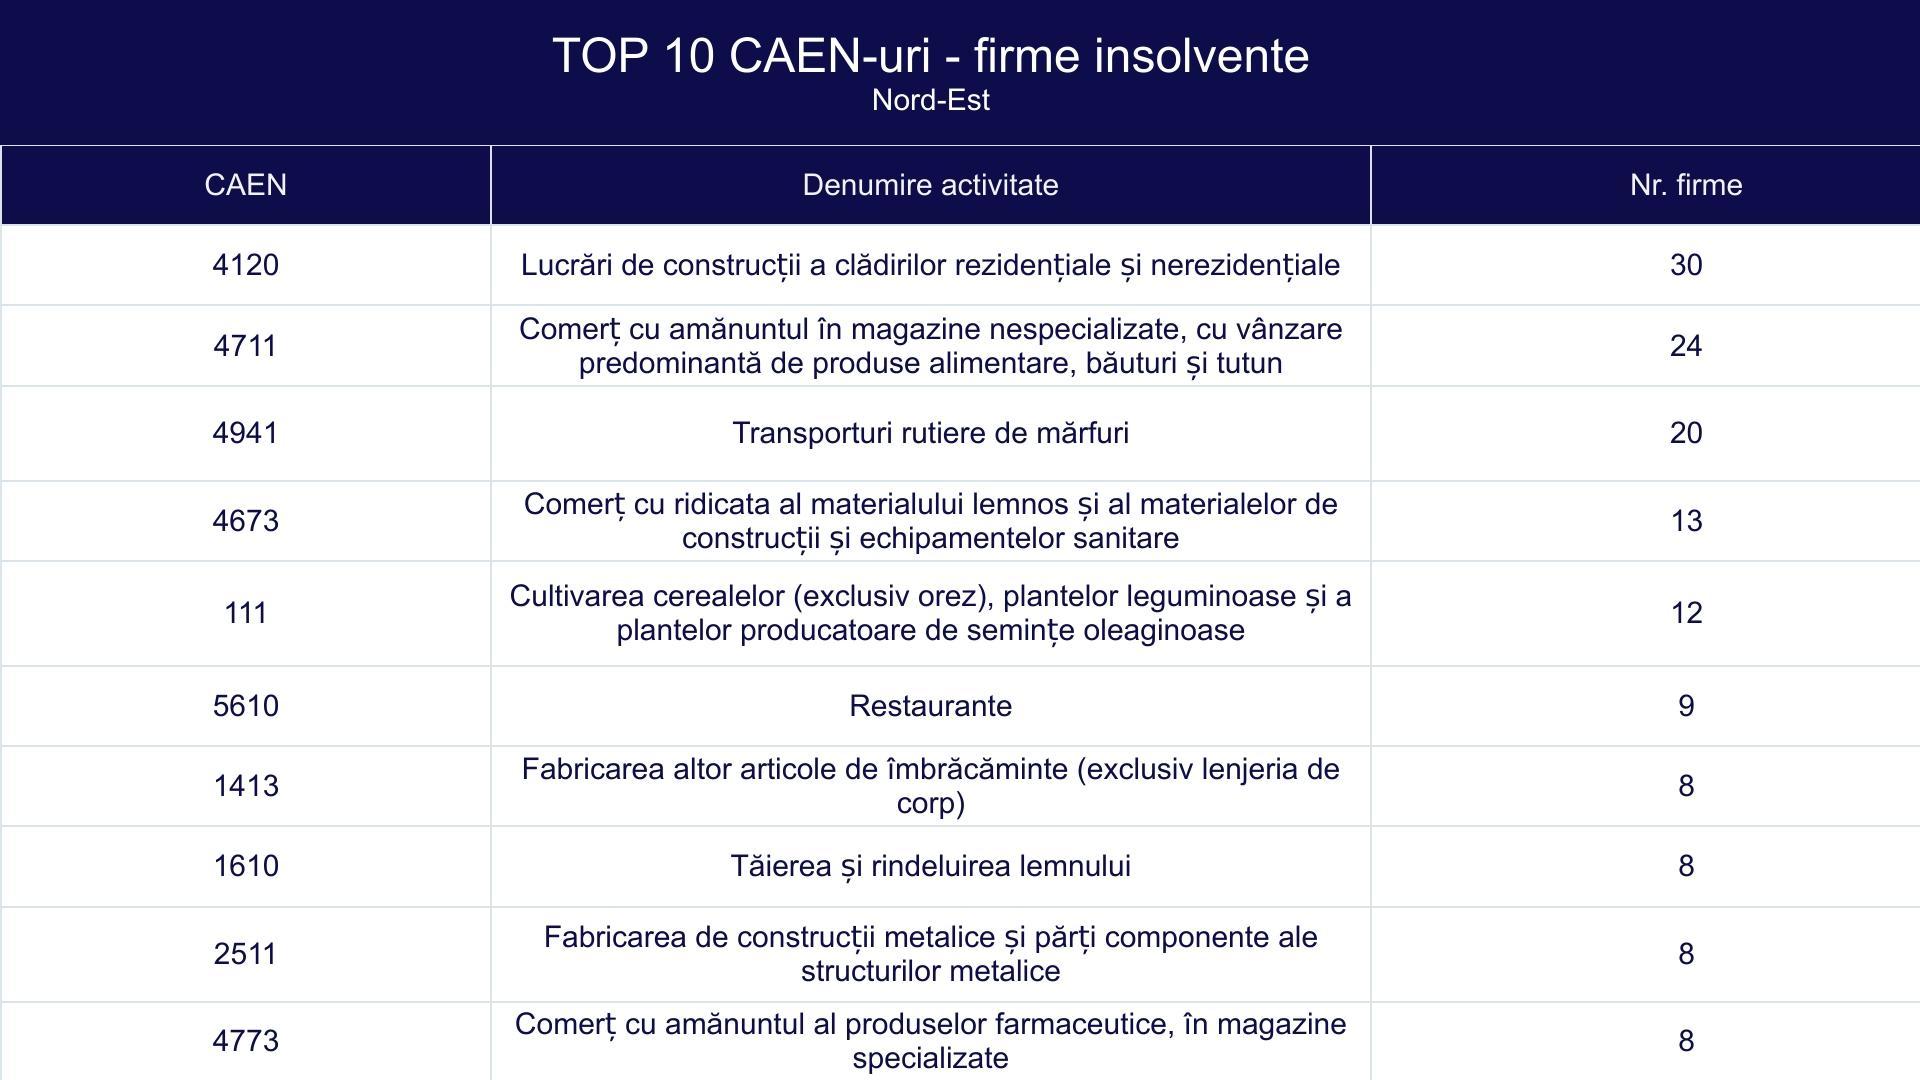 TOP 10 CAEN-uri - firme insolvente - Nord-Est